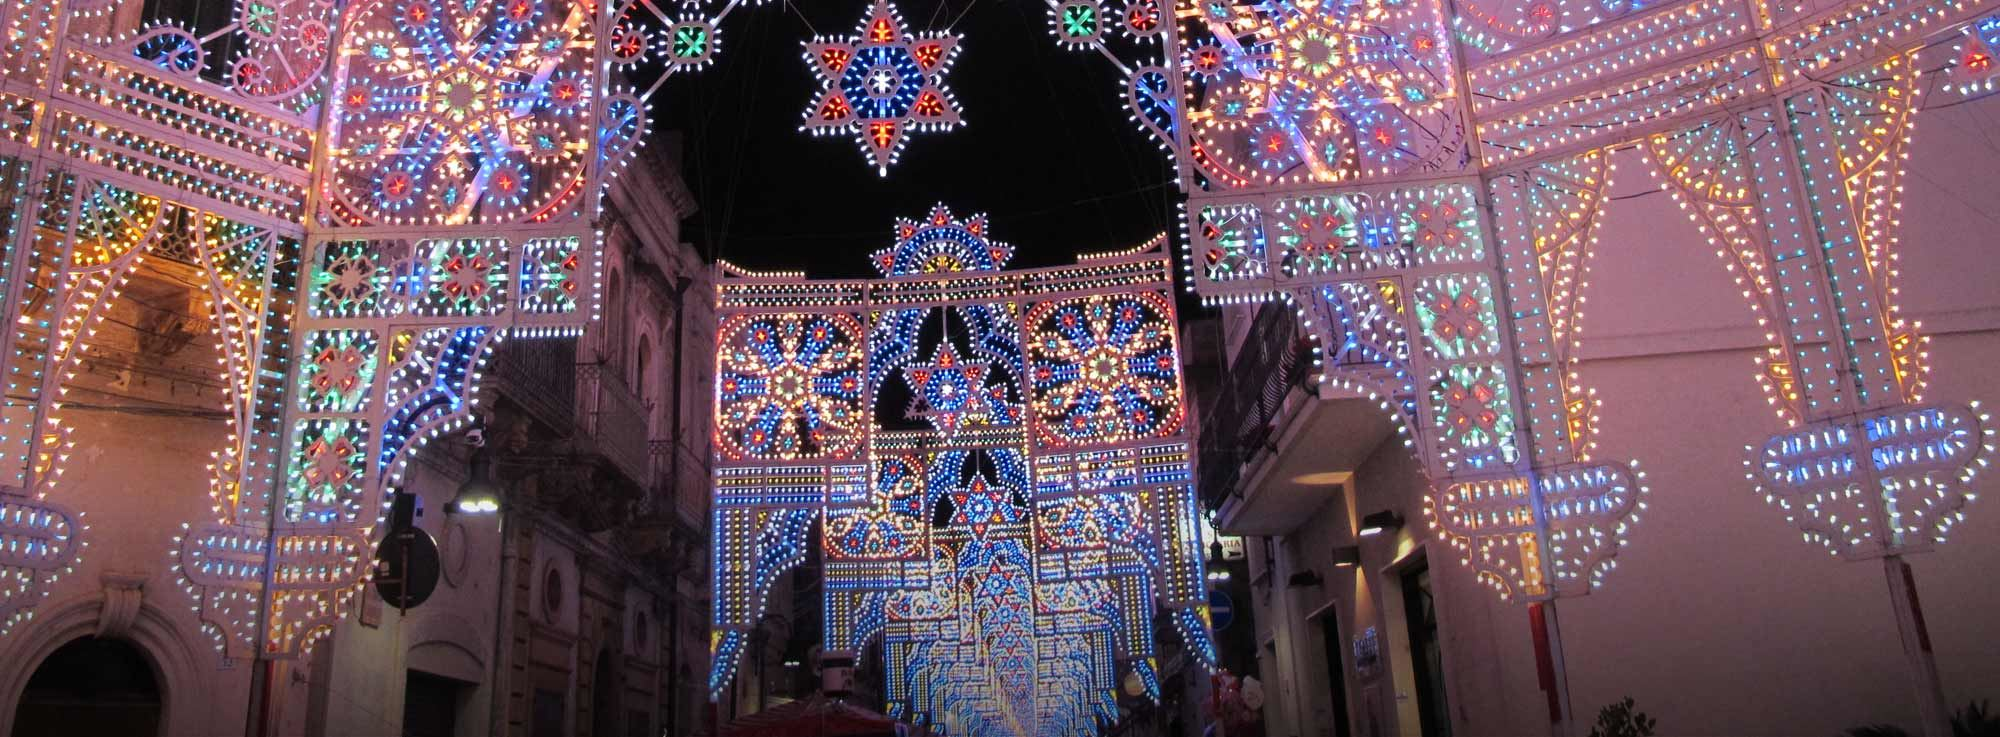 Villa Castelli: Festa Patronale